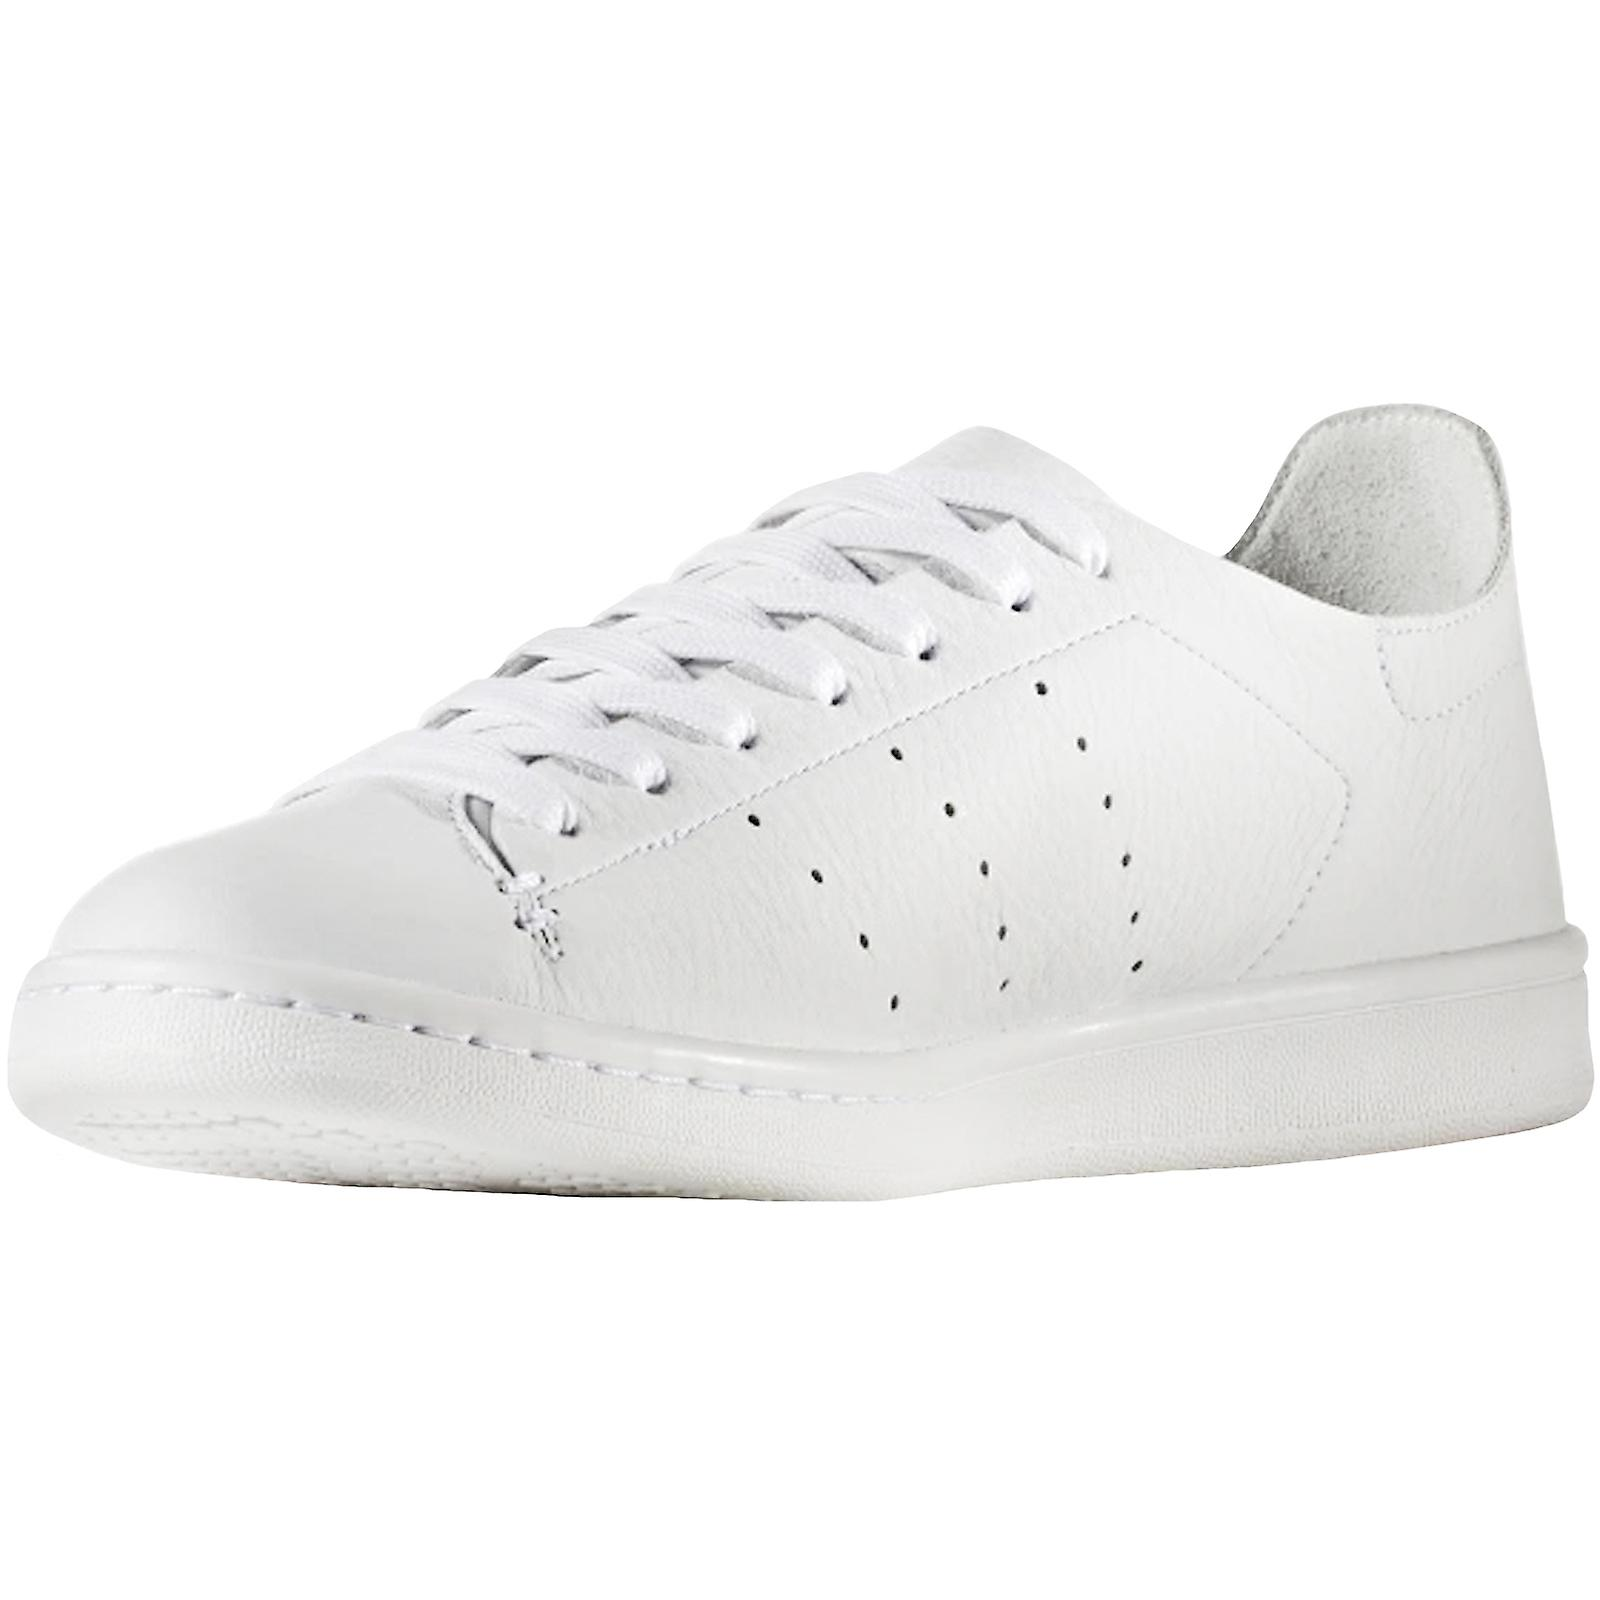 adidas Originals Mens Stan Smith Cuir Sock Casual Trainers Sneakers - Blanc